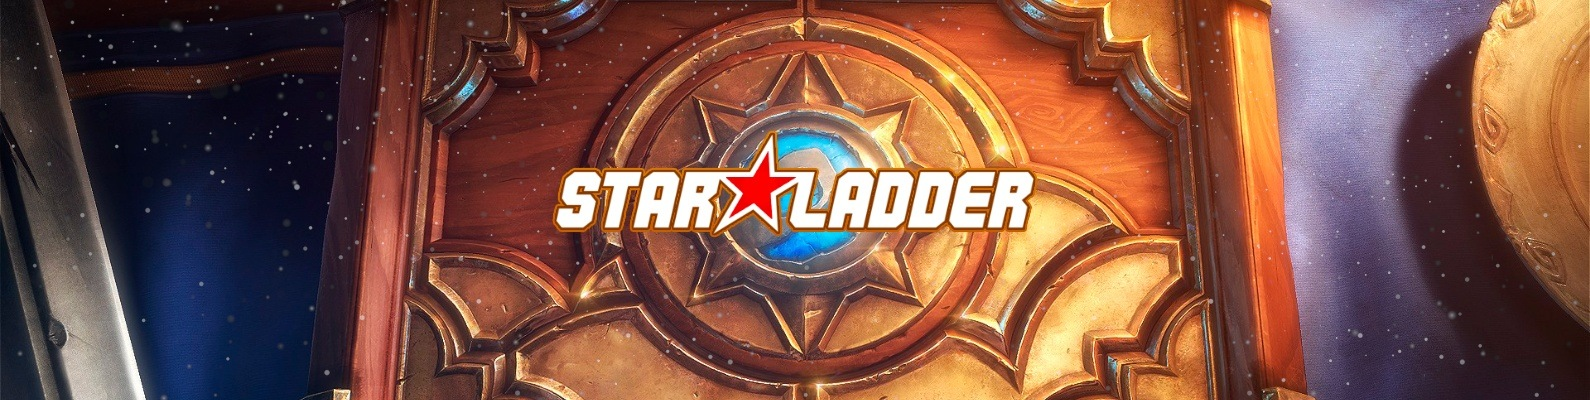 Hearthstone Starladder